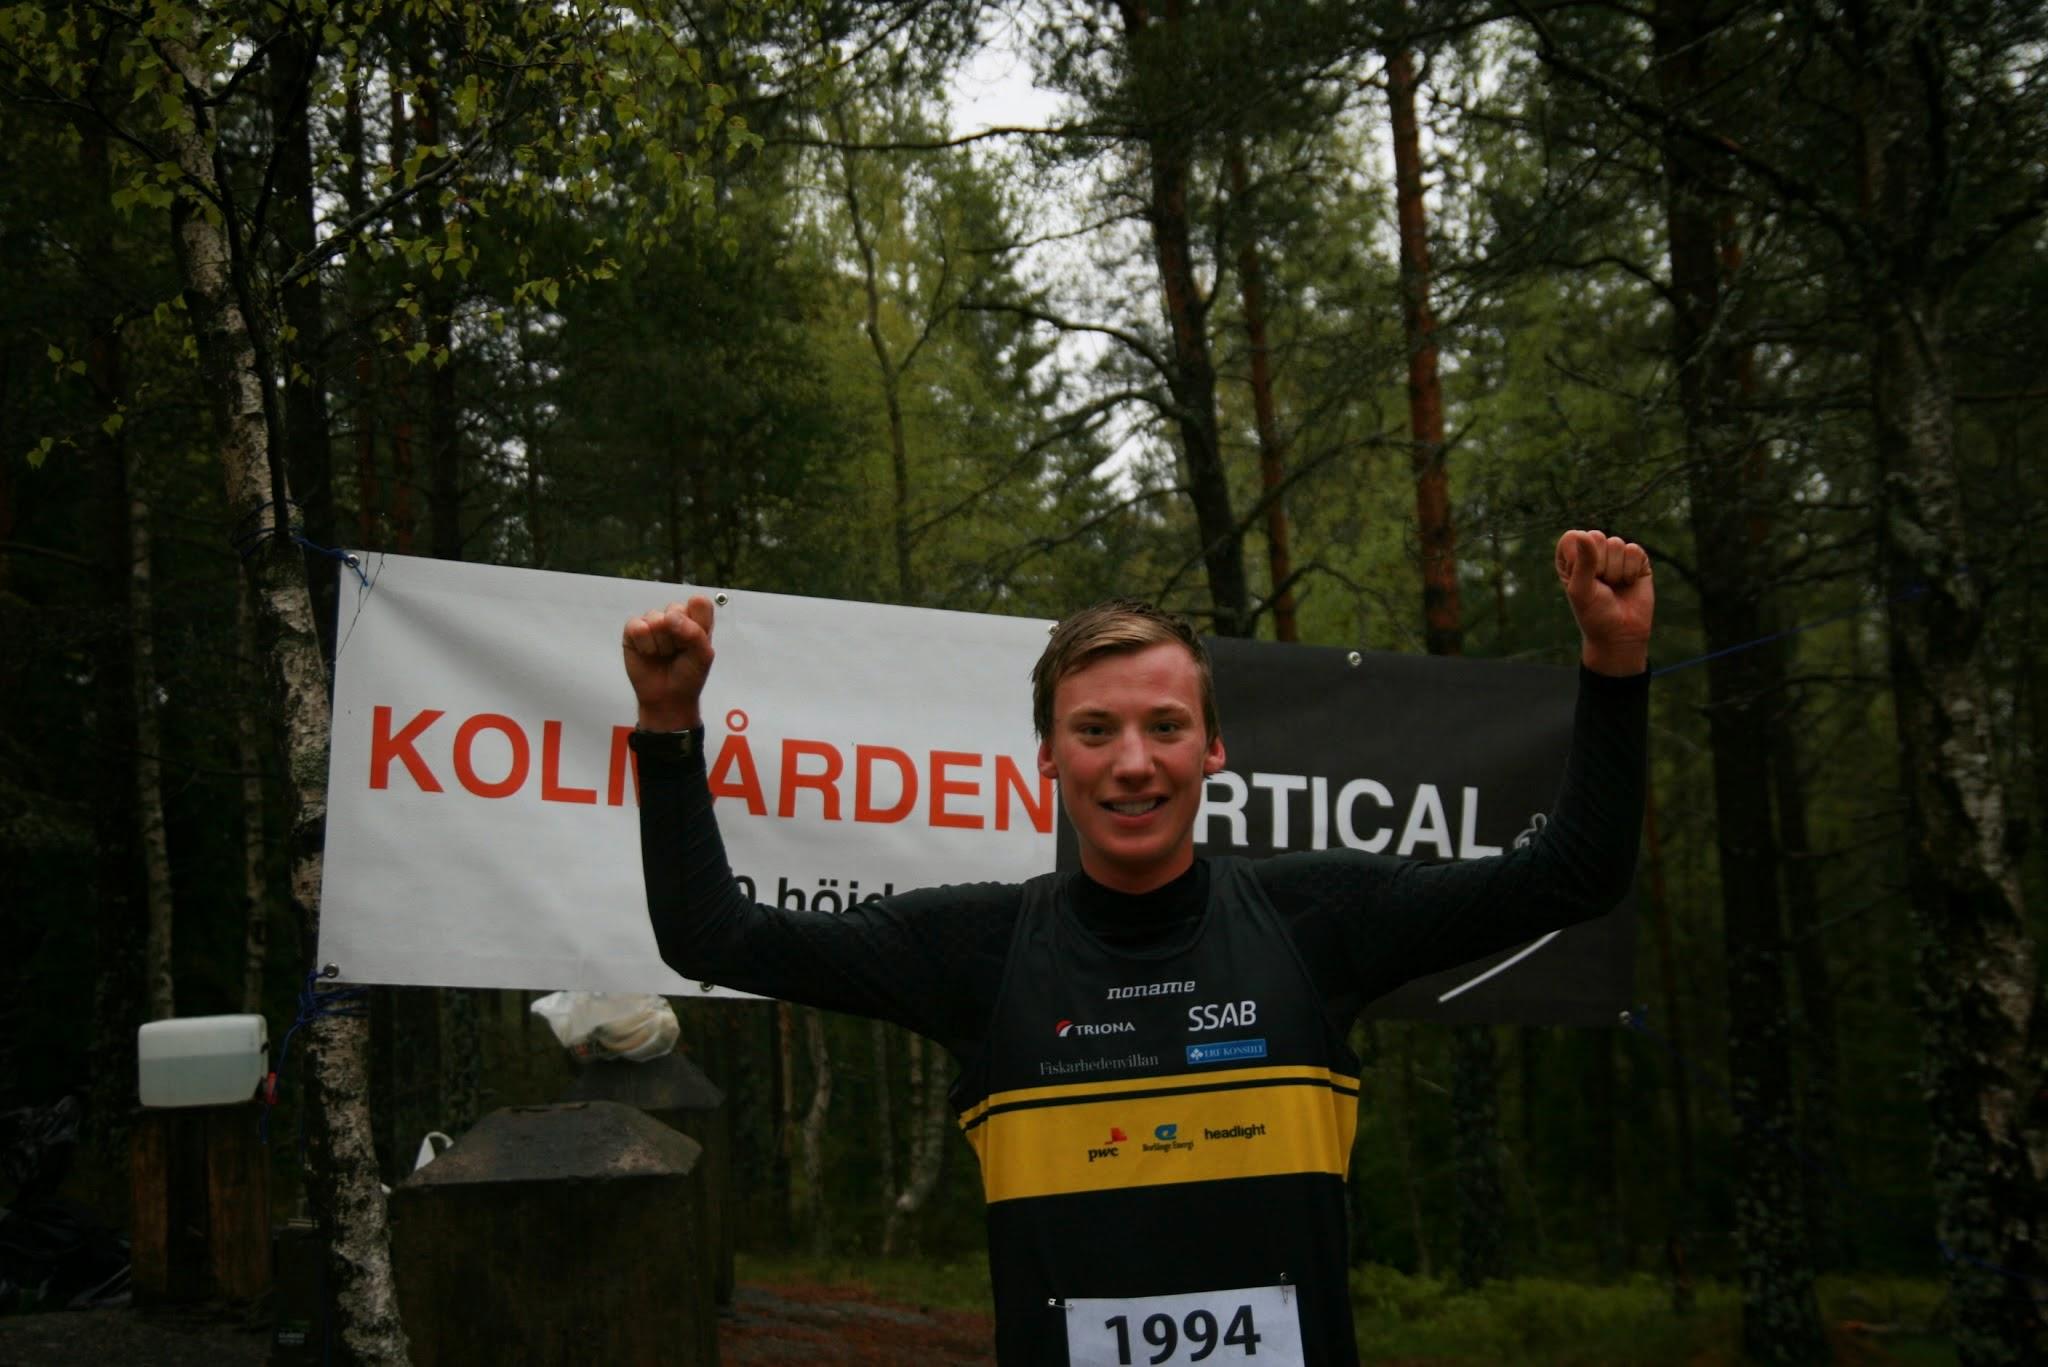 Photo: Emil Svensk JVM-Guld orientering 2013 - nu vinnare i Kolmården Vertical 2014! Stort grattis!